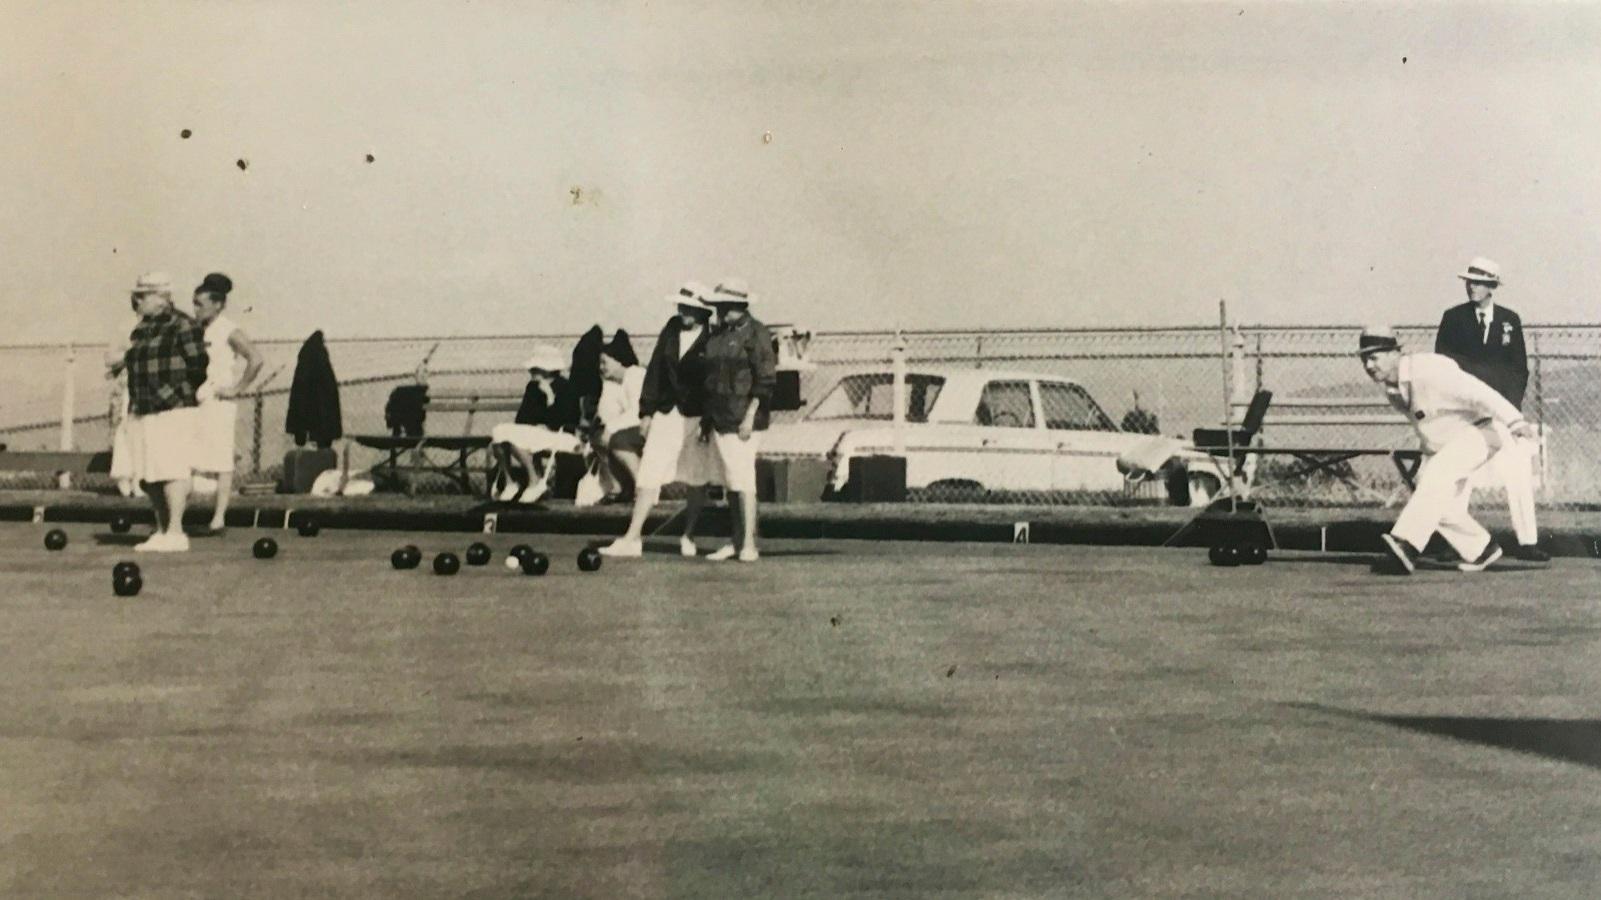 Lawn Bowling at Jefferson Park since 1942